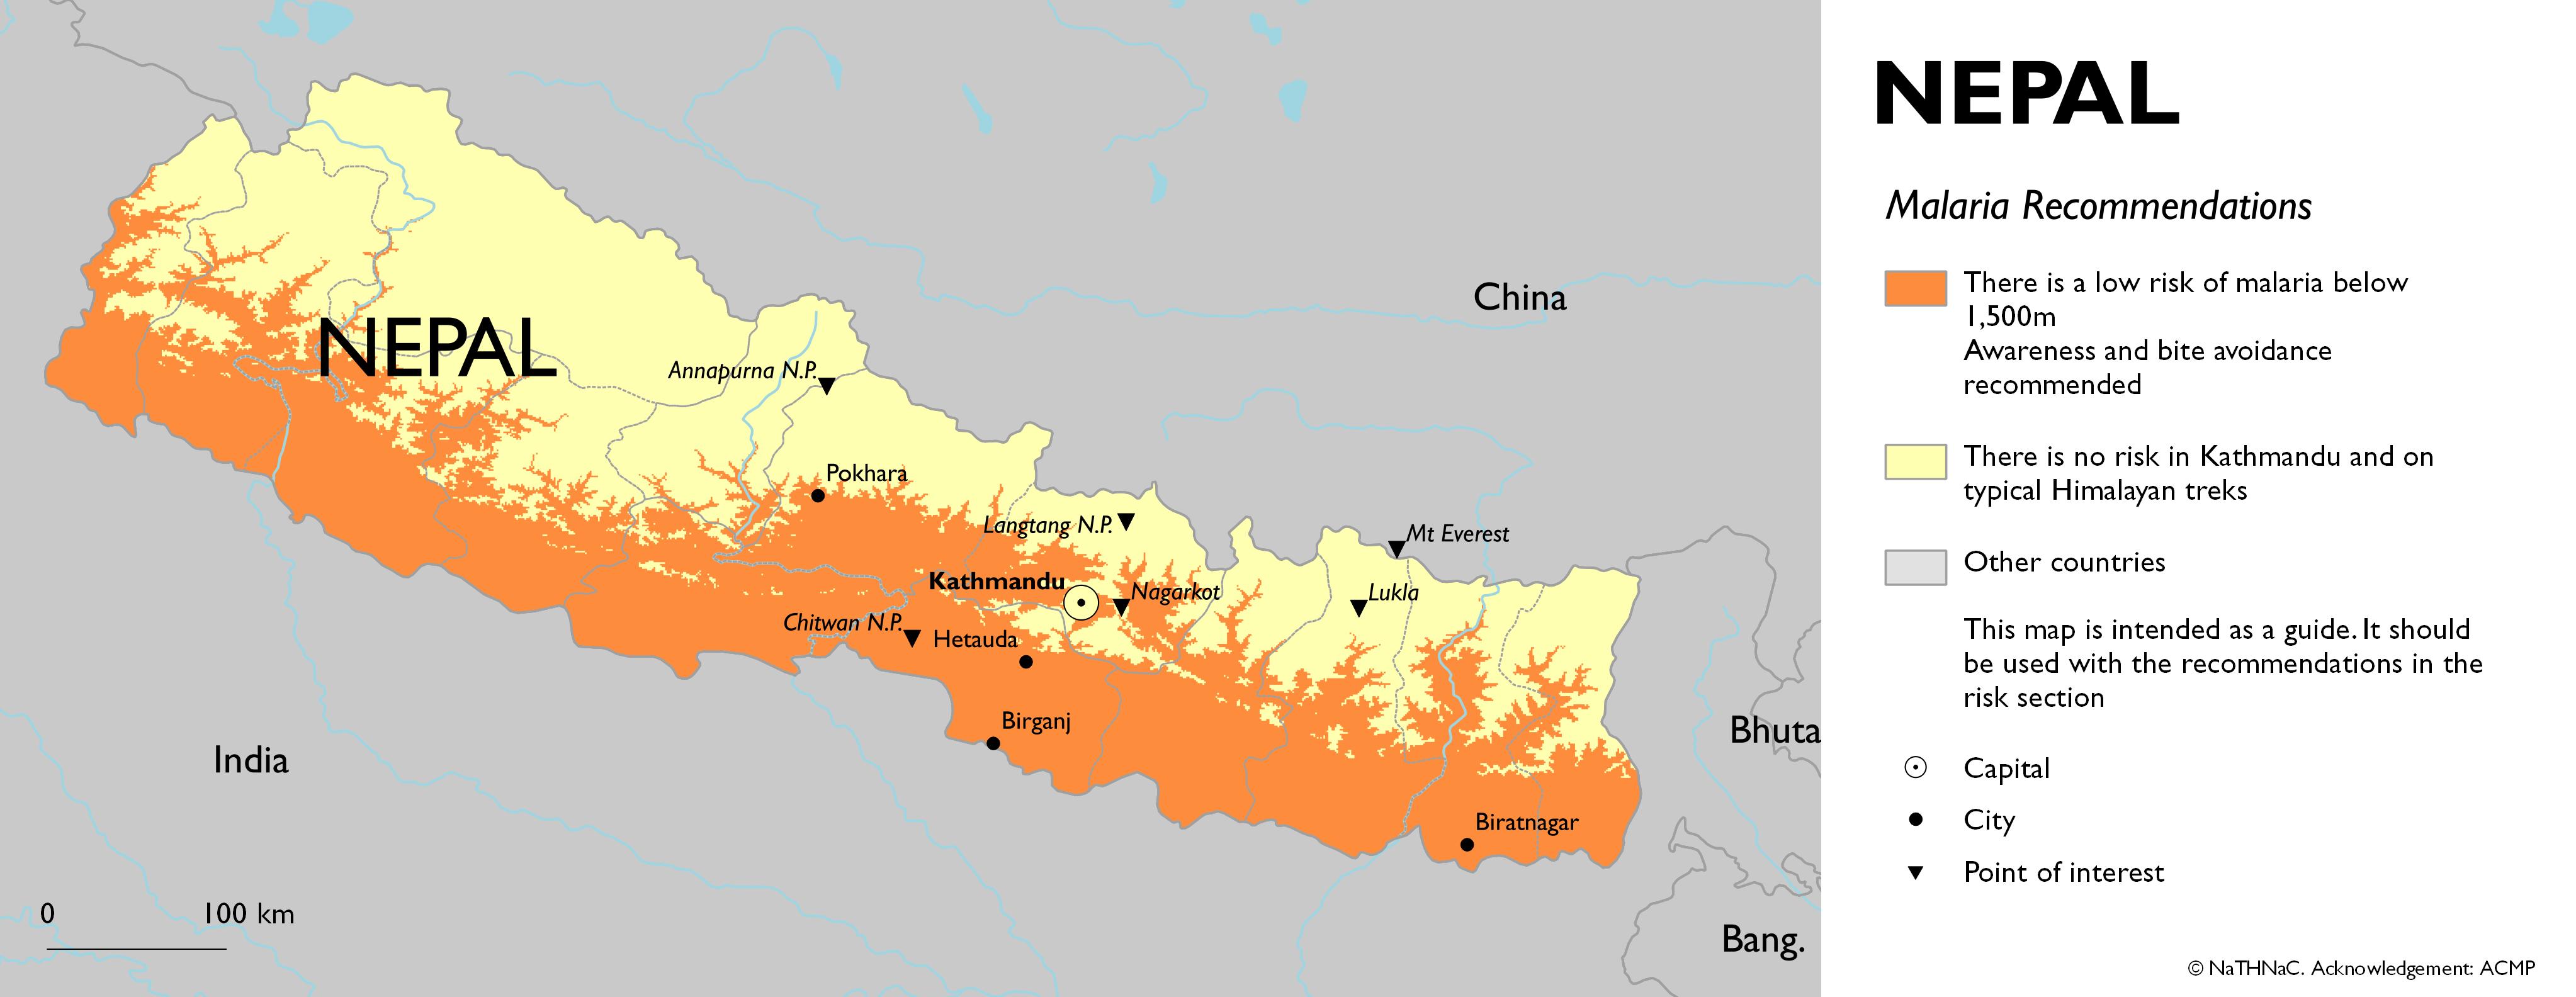 NaTHNaC - Nepal